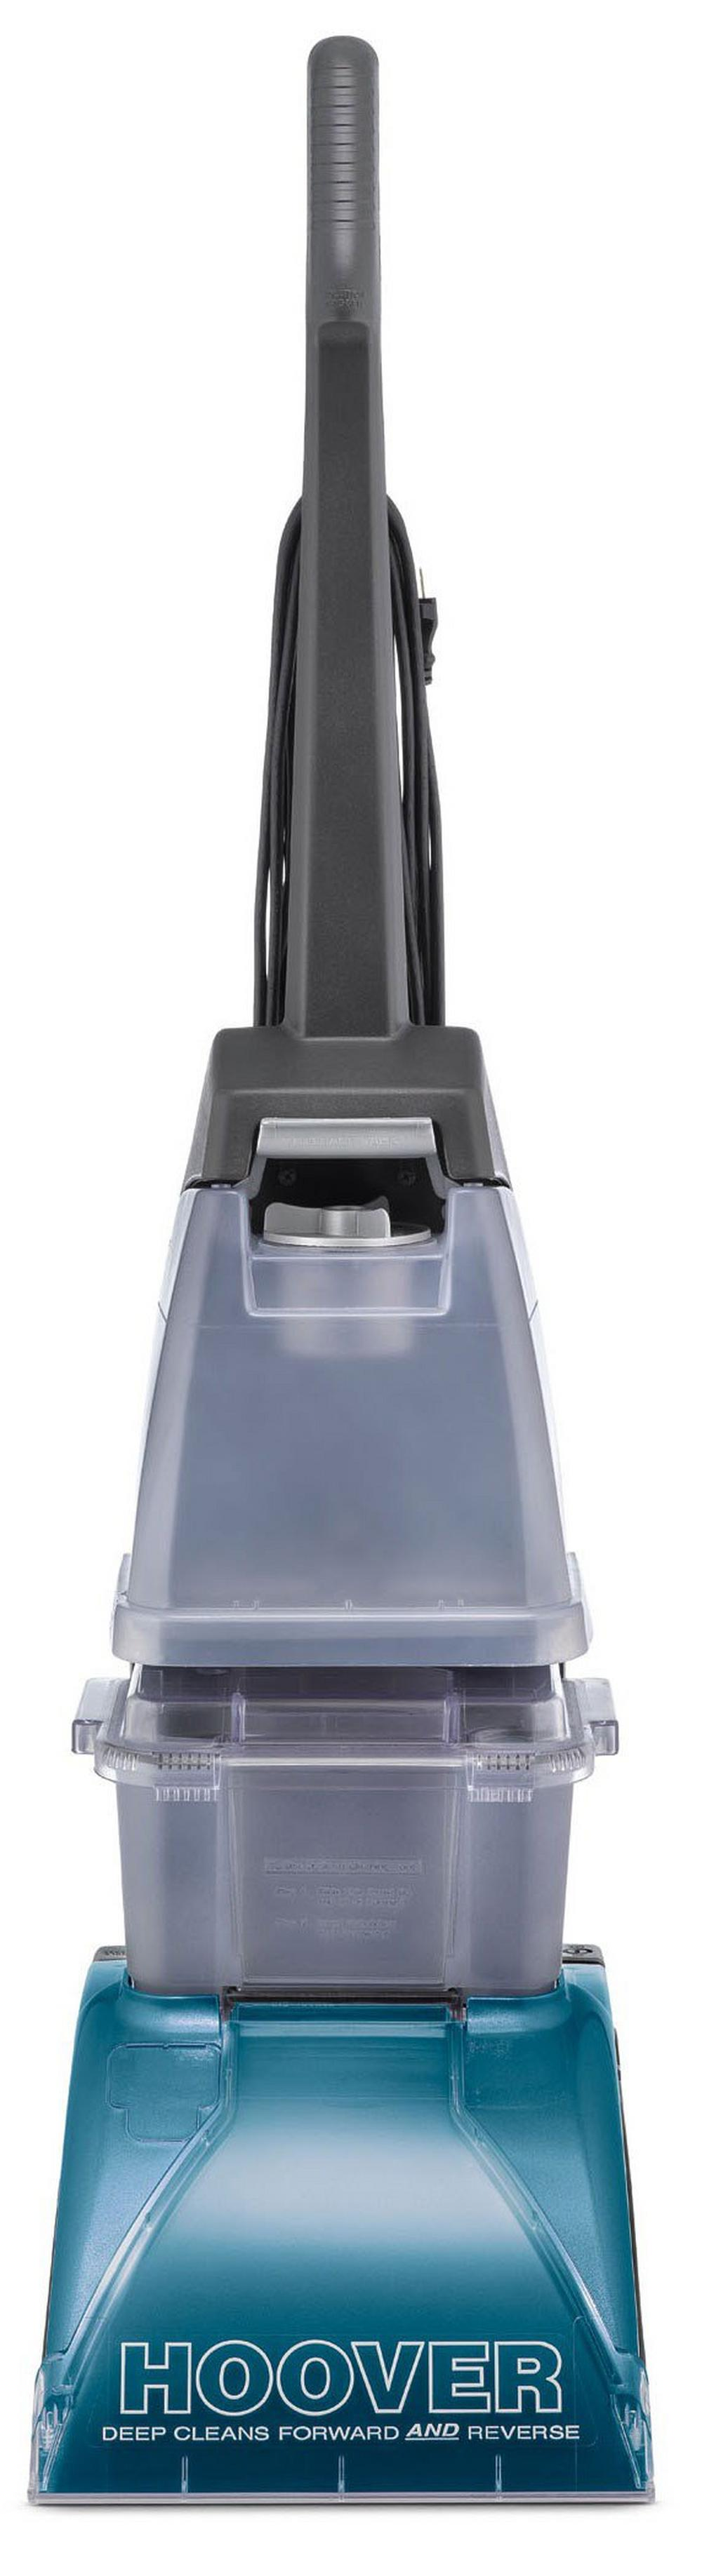 SteamVac Carpet Cleaner1